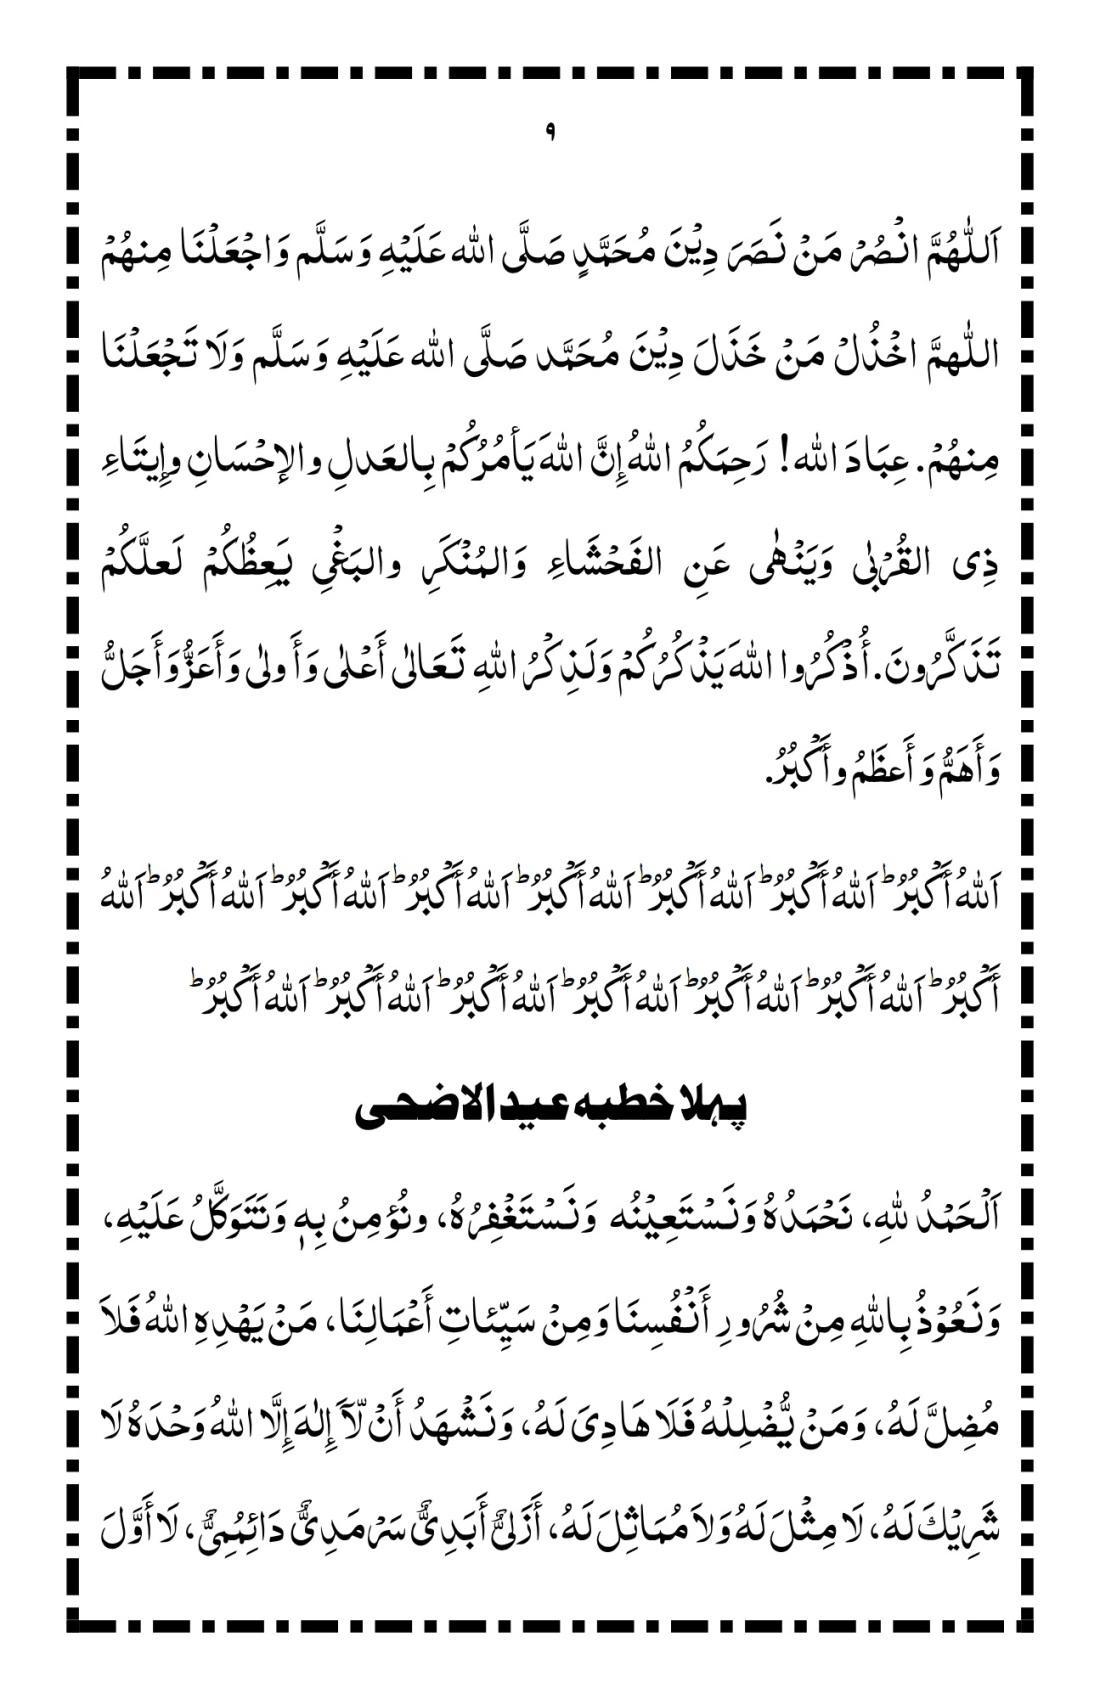 khutba-eif-ul-fitr-adha-4